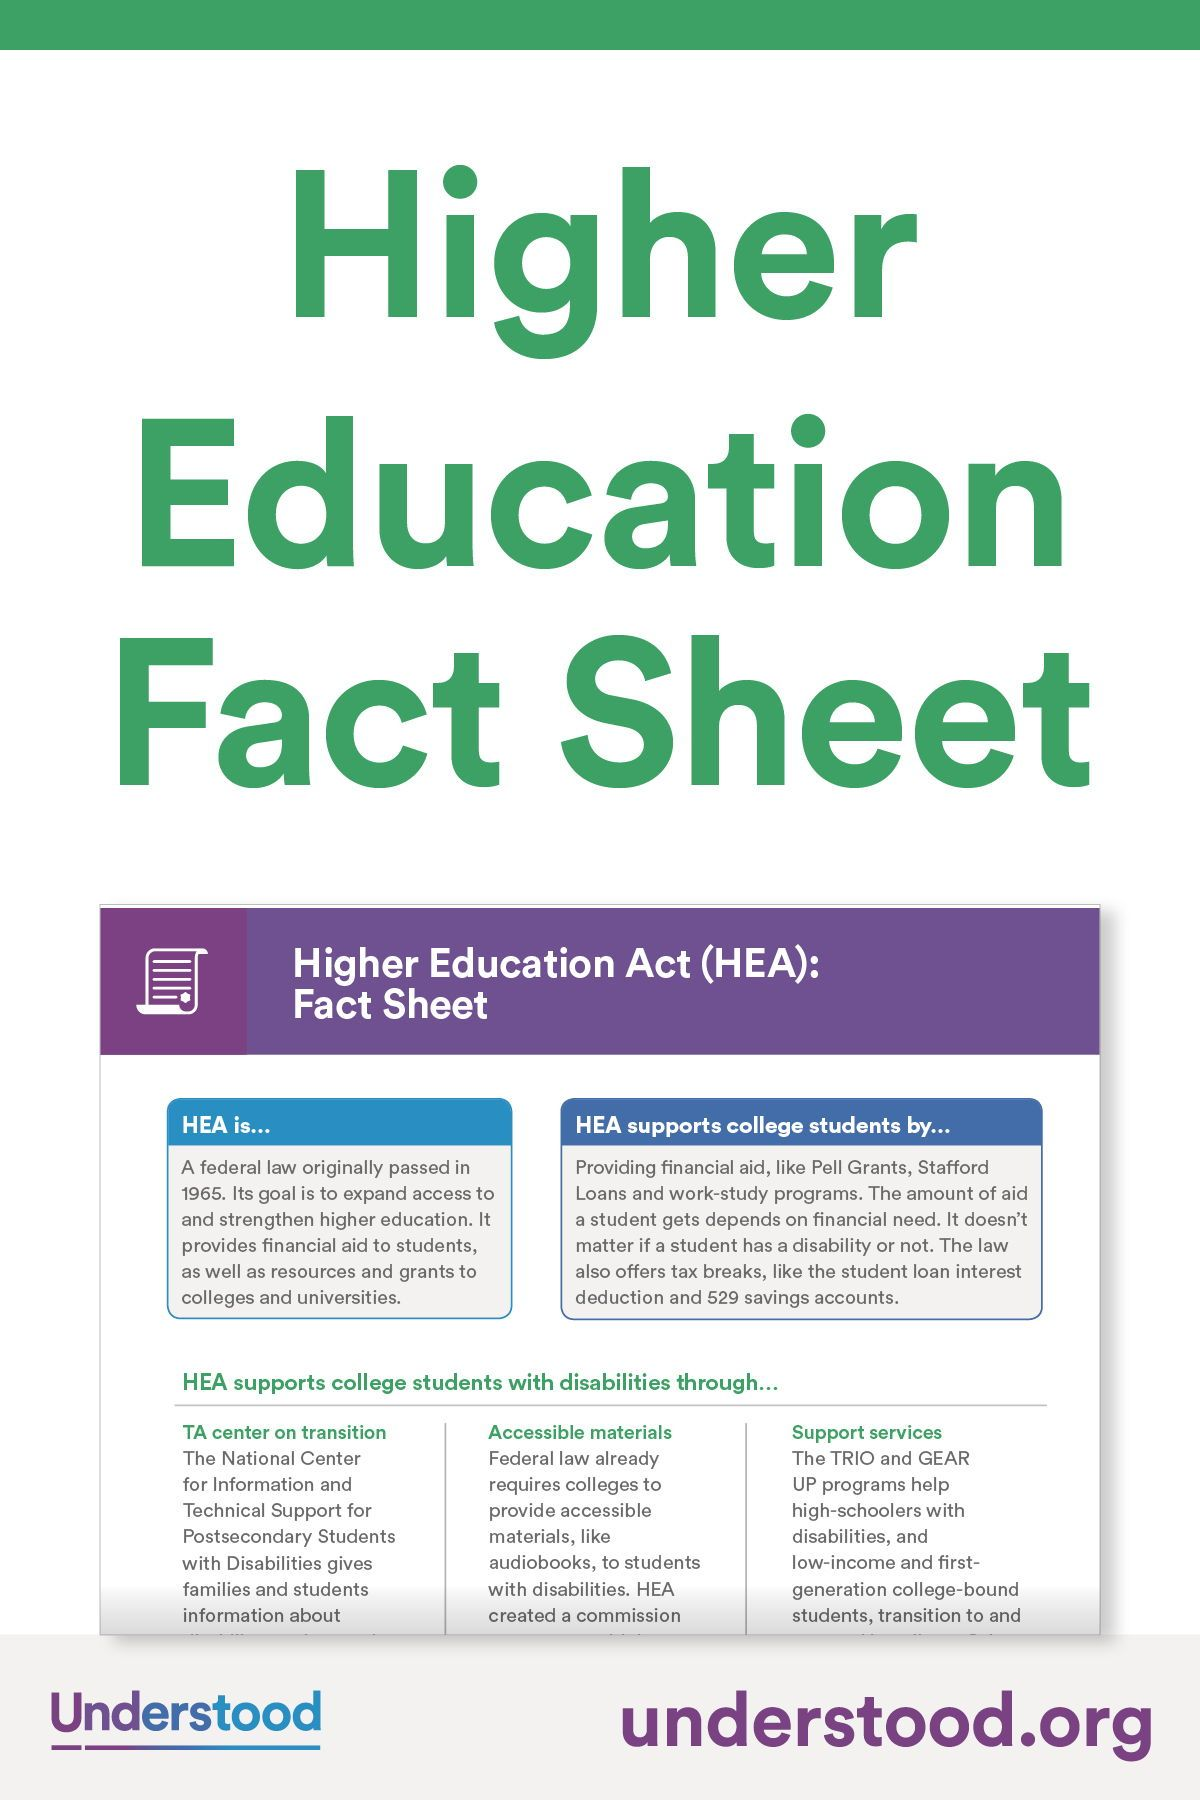 Higher Education Act Fact Sheet Higher Education Education Fact Sheet